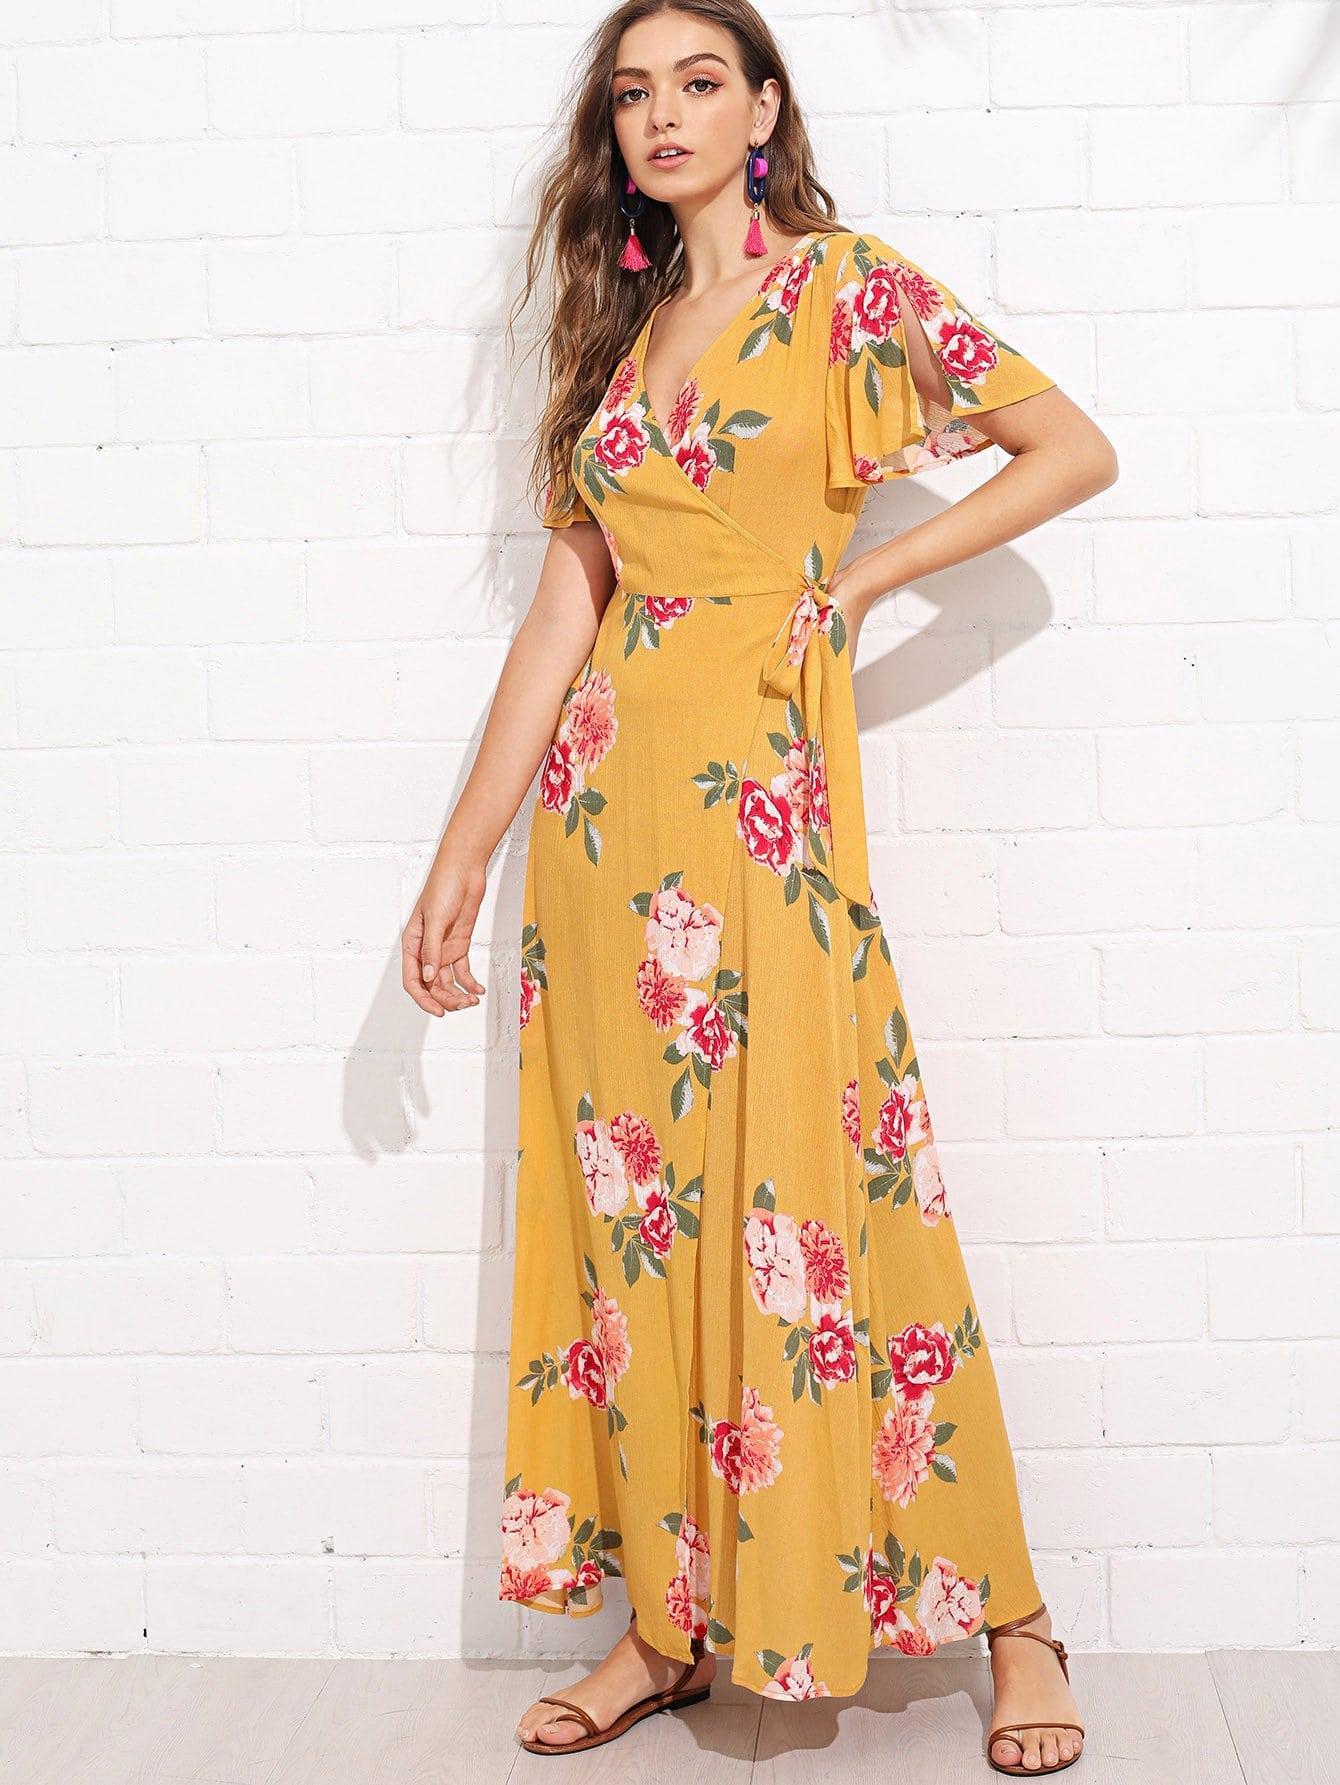 Flower Print High Low Wrap Dress emoji print high low night dress